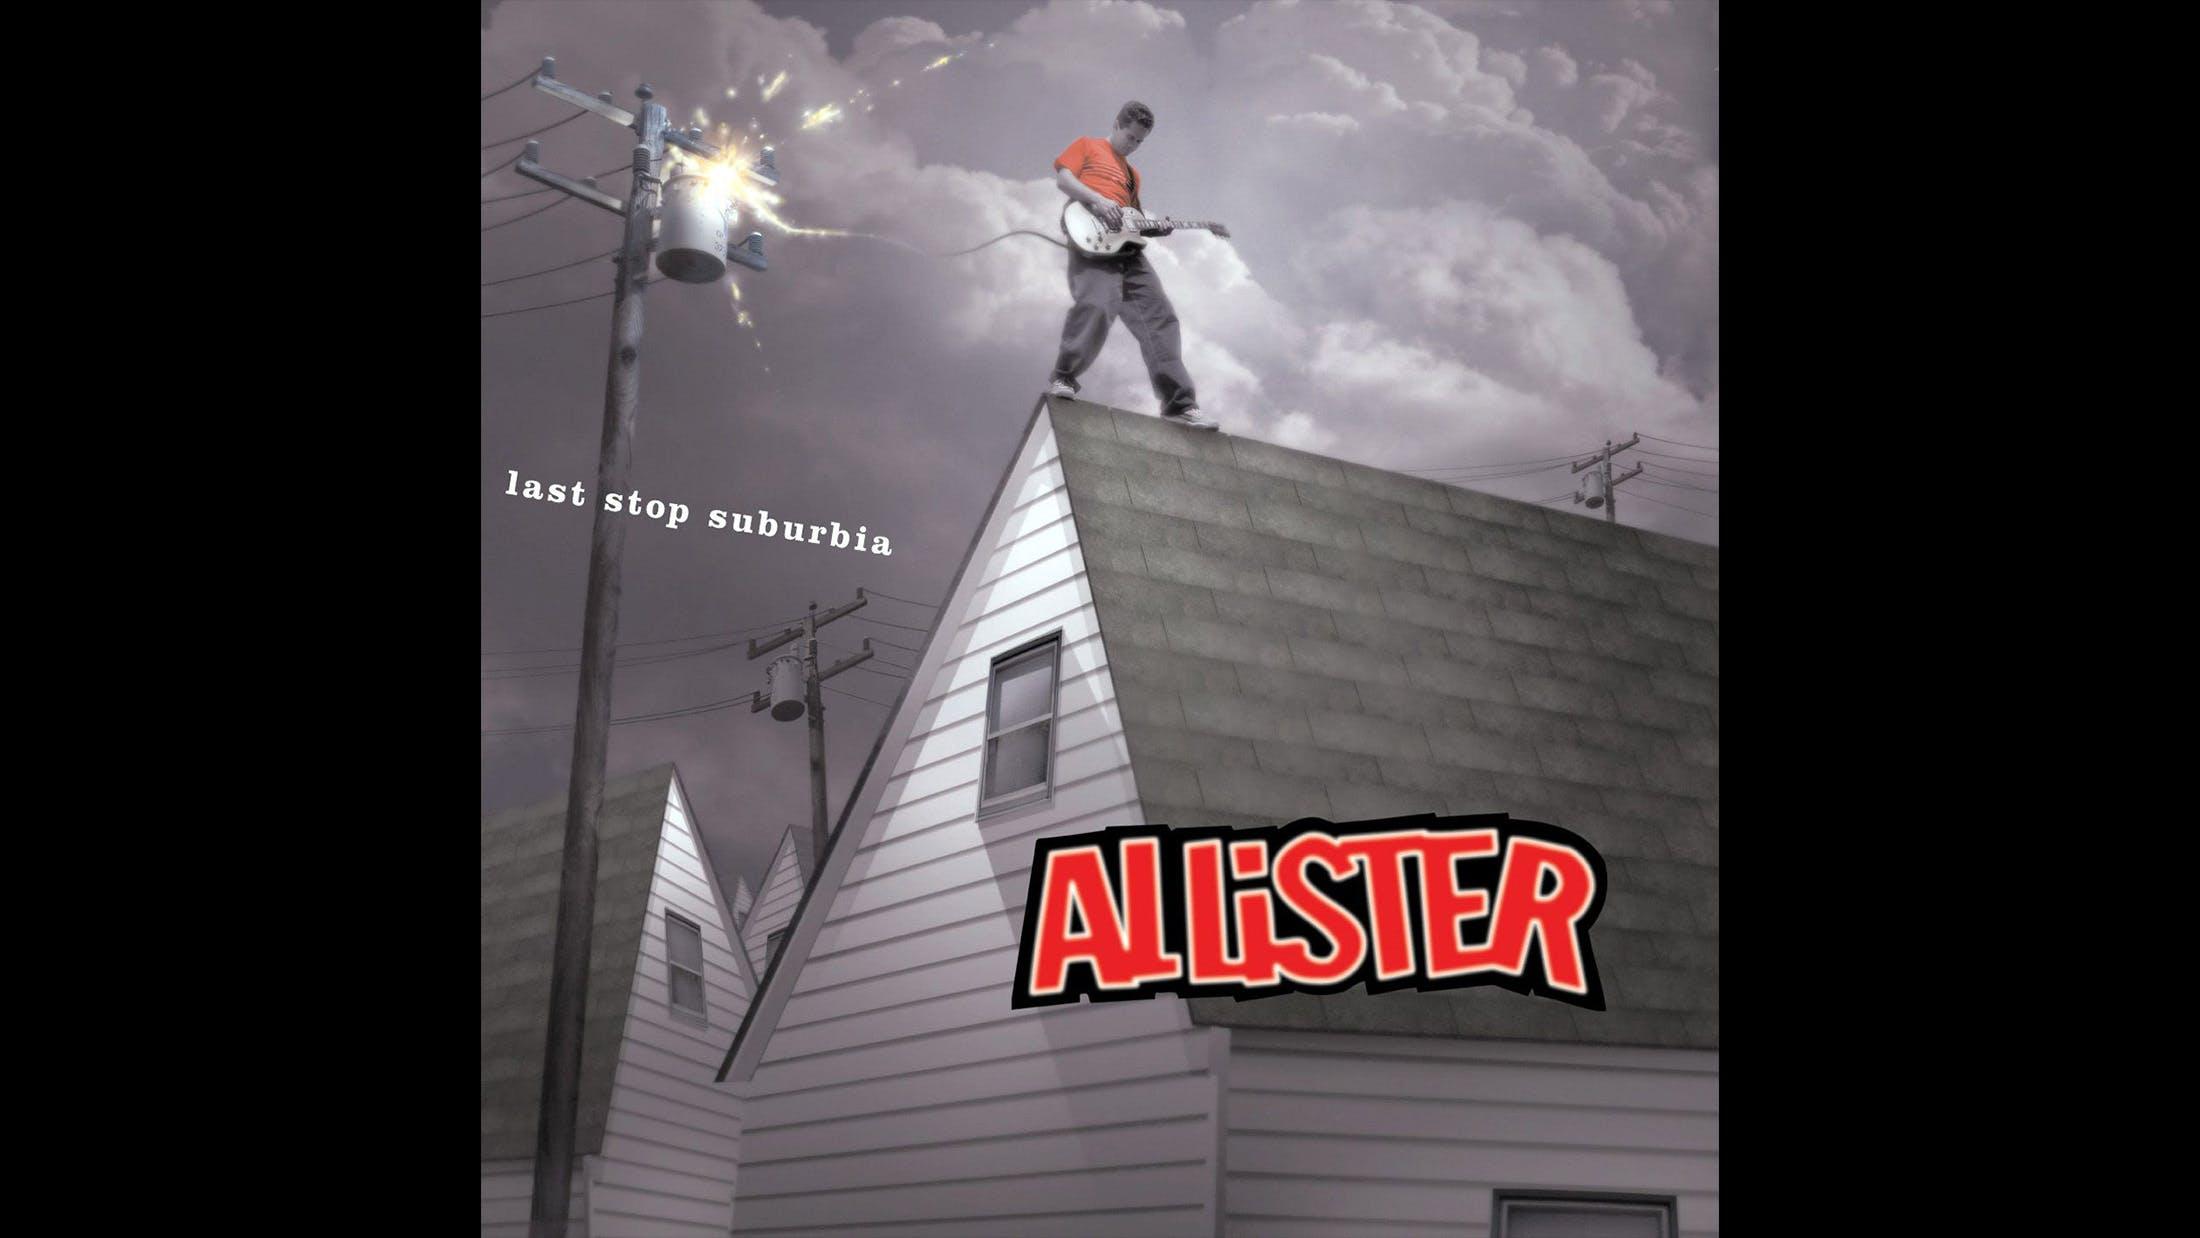 50. Allister - Last Stop Suburbia (2002)